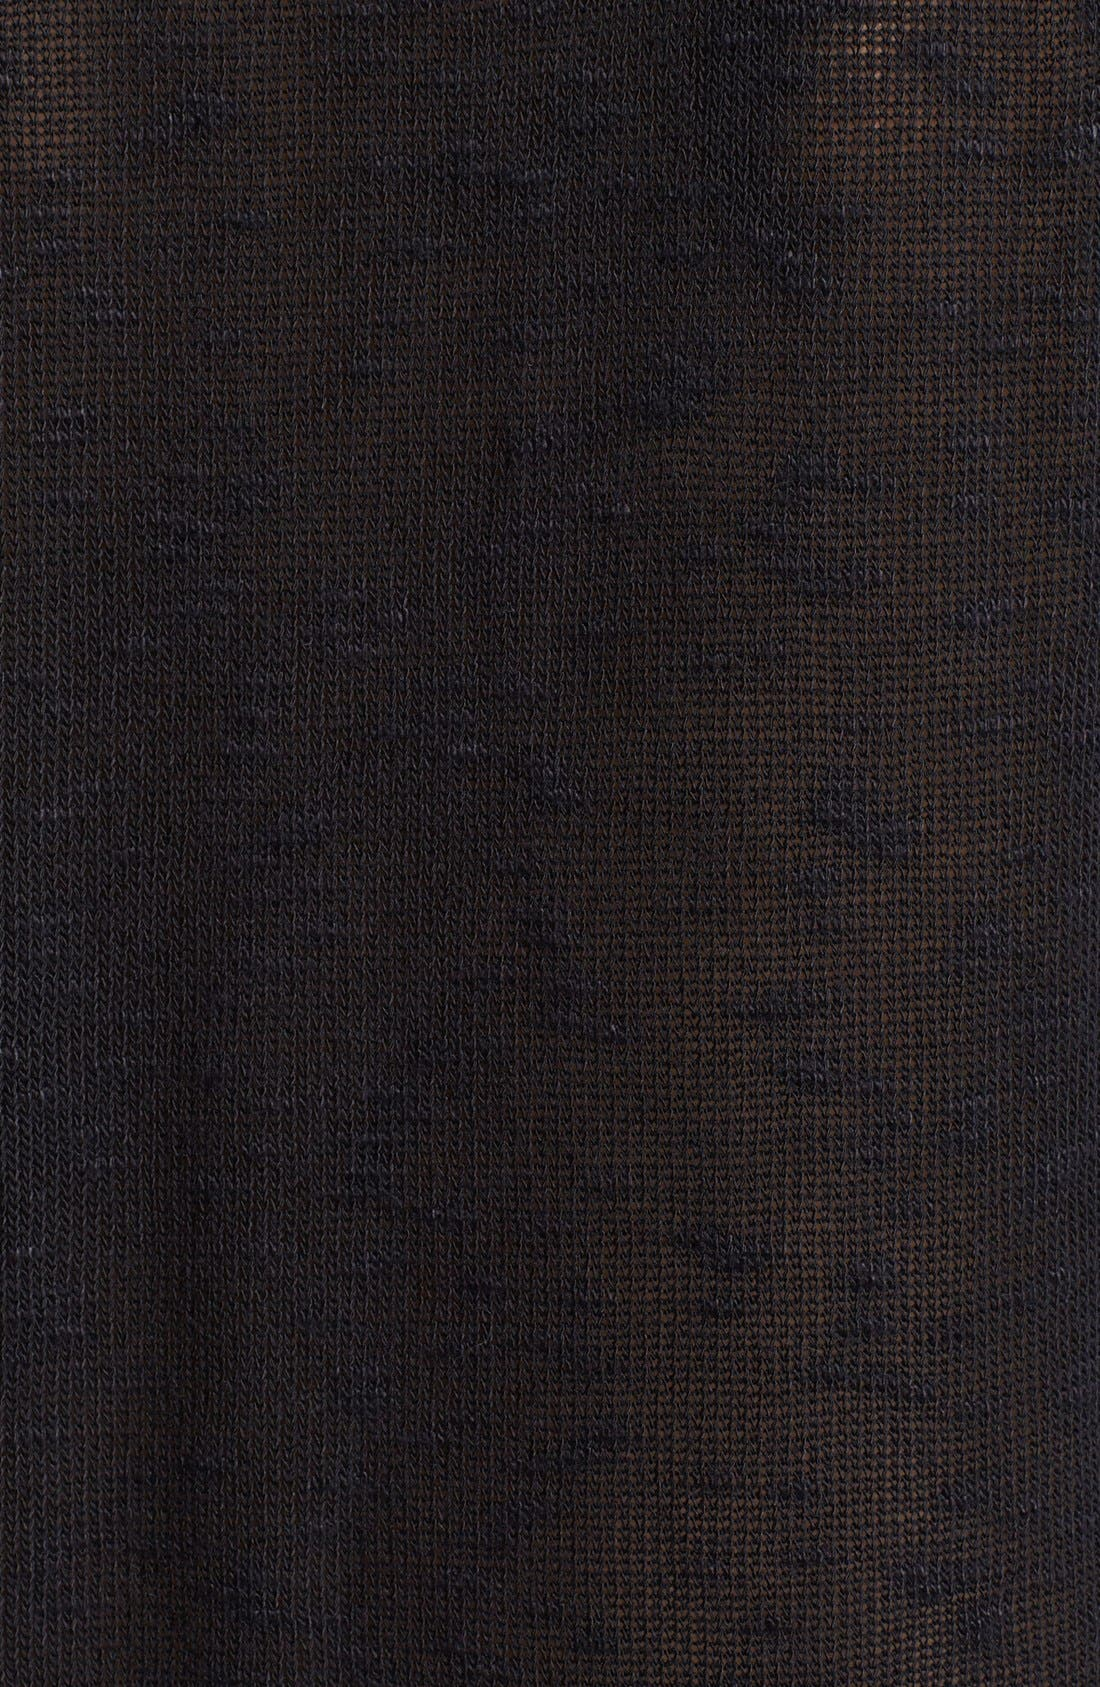 Alternate Image 3  - Soft Joie 'Wayne' Cowl Neck Sweater